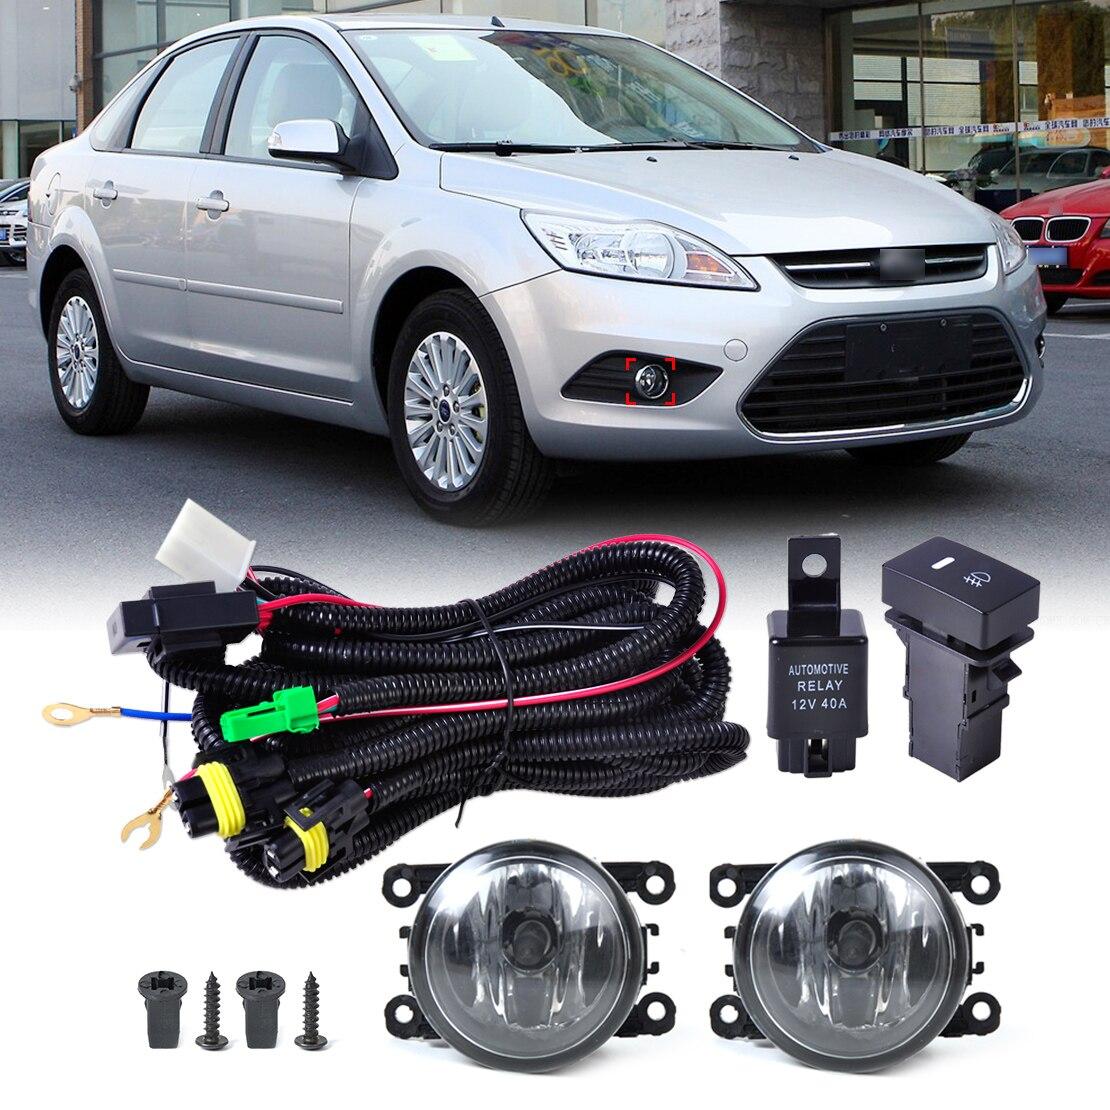 ФОТО DWCX Wiring Harness Sockets + Switch + 2pcs Fog Lights Lamp 4F9Z-15200-AA for Ford Focus Honda CR-V Acura Nissan Suzuki Subaru